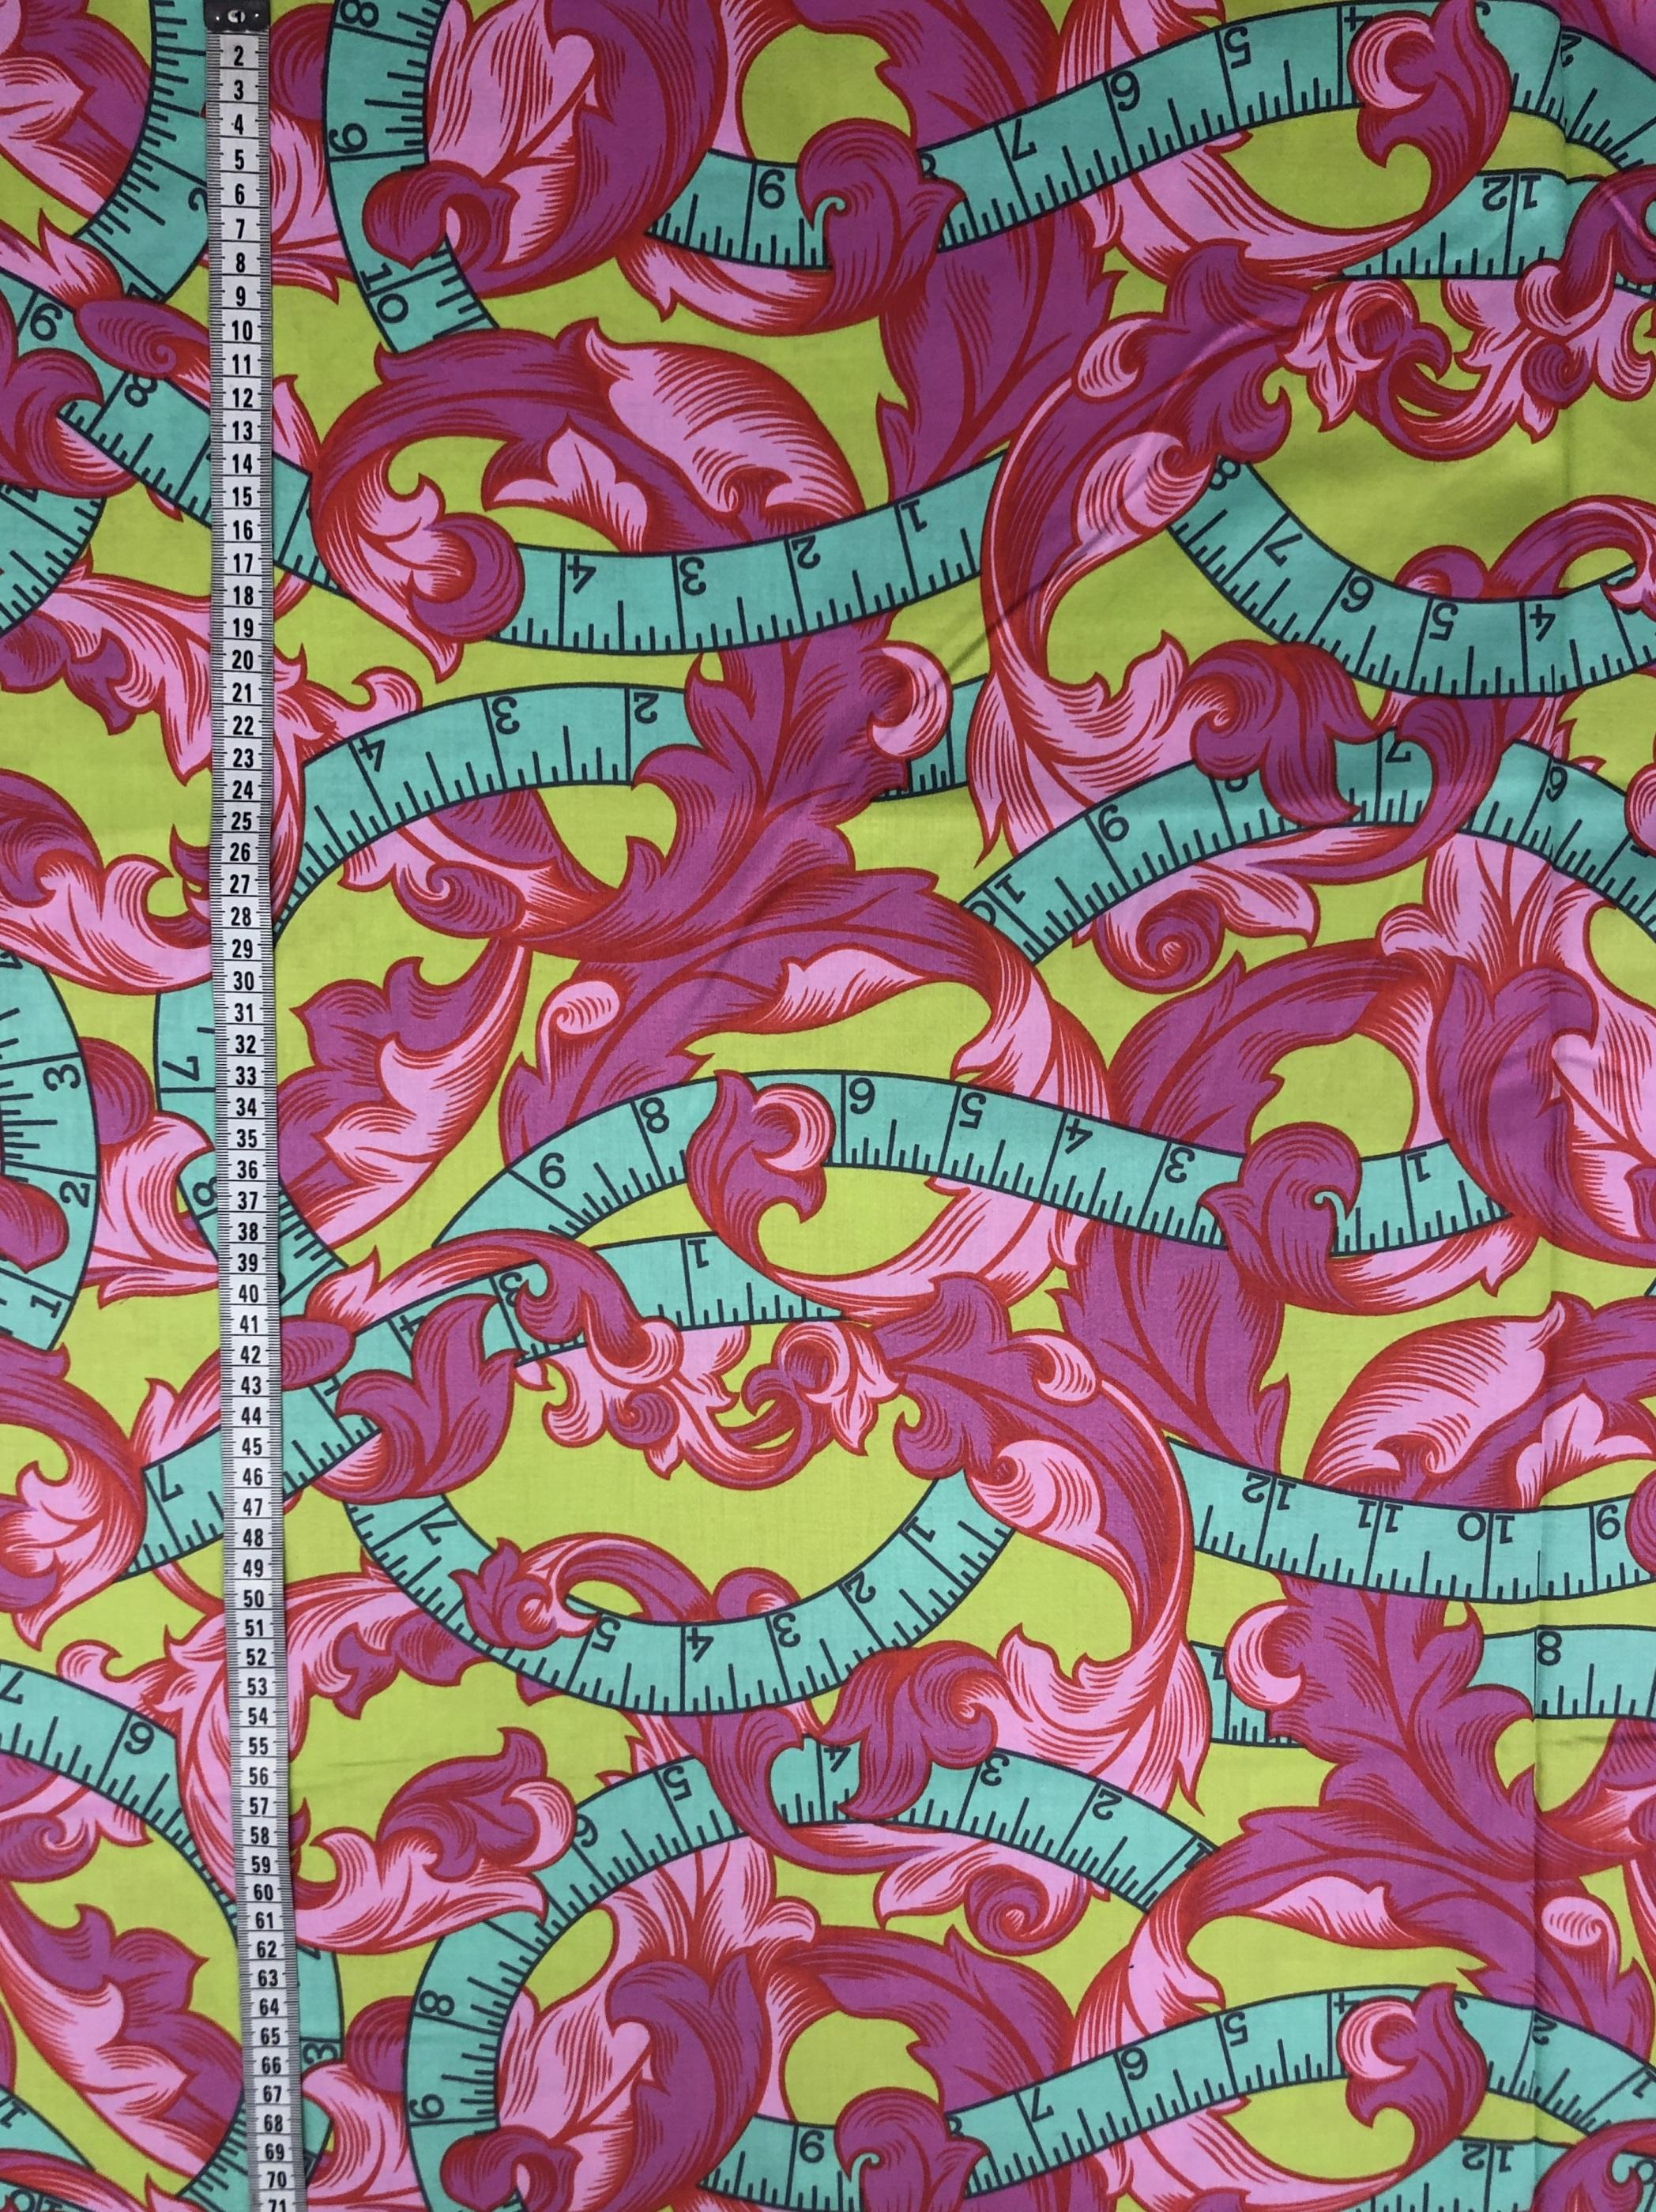 måttband metervara rosa grön blå djungel dubbel bredd modetyg hemtextil tyglust laholm